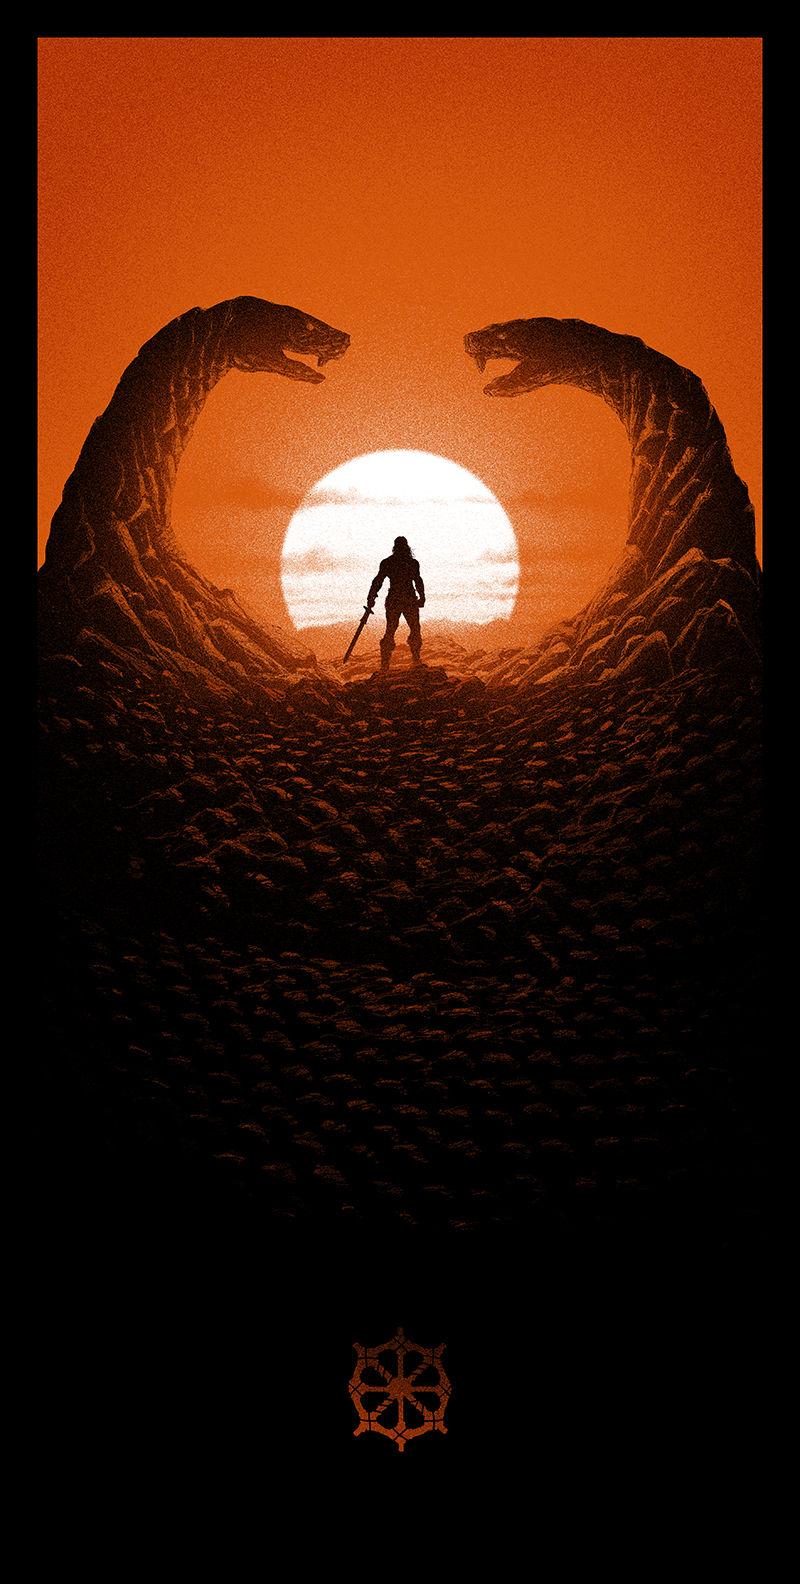 stunning-poster-art-for-iconic-movies-by-matt-fergusonMarko-Manev-Conan.jpg